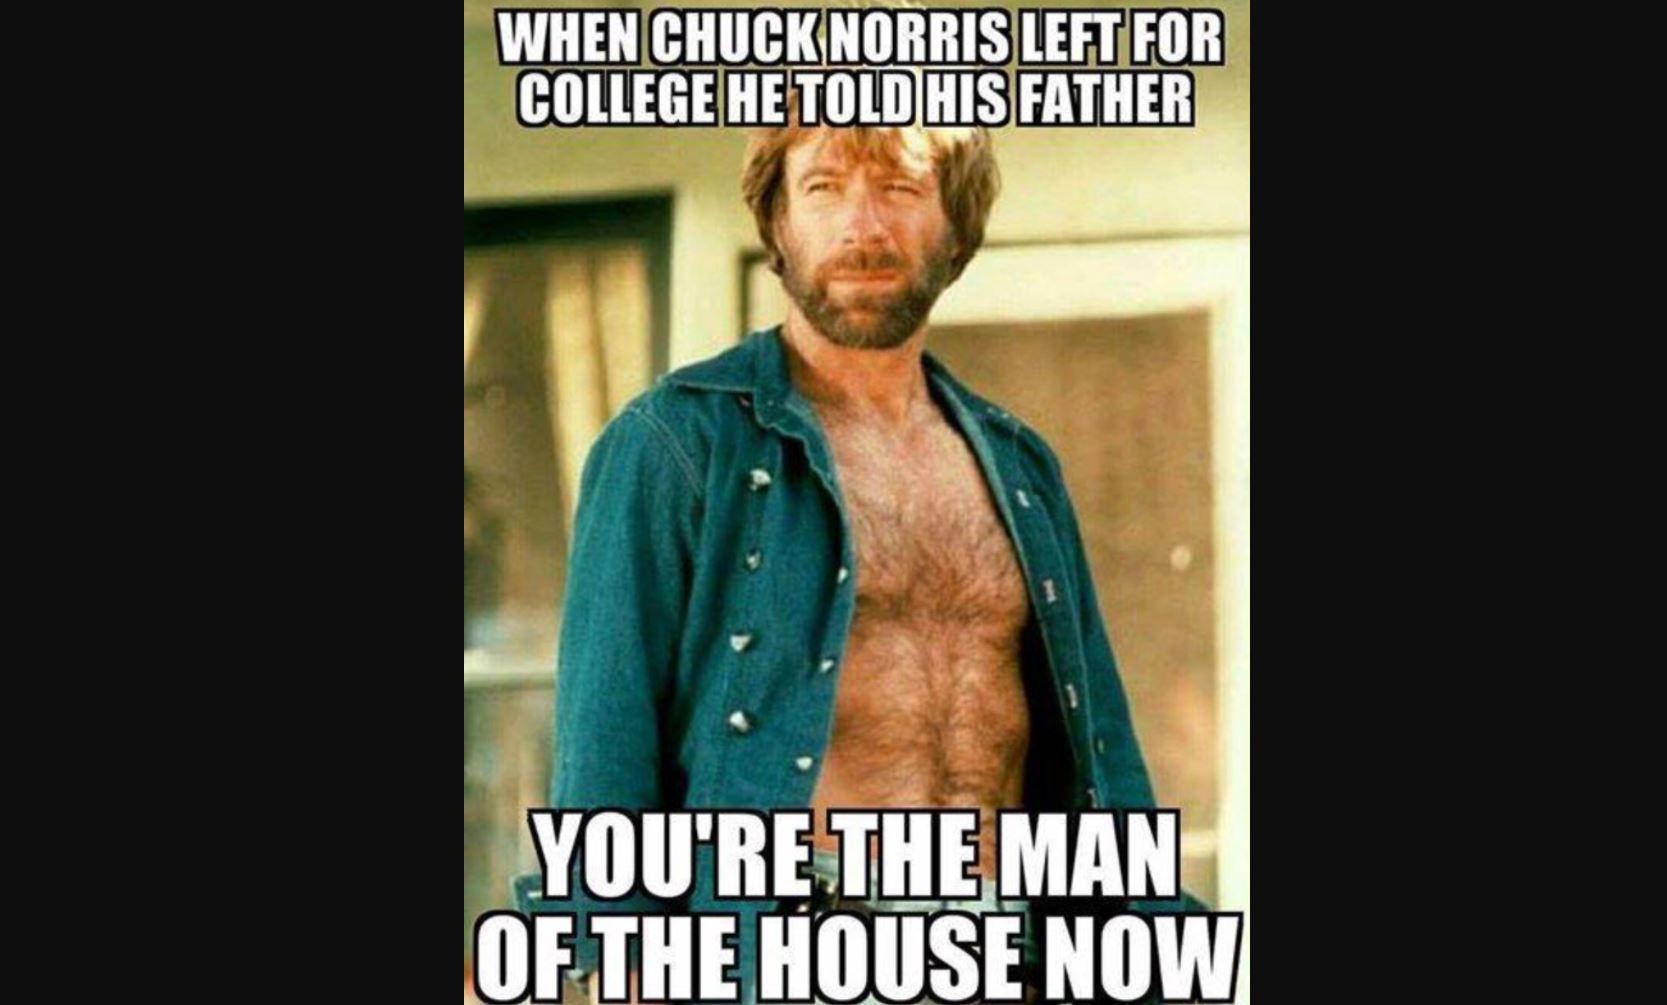 chuck norris college meme